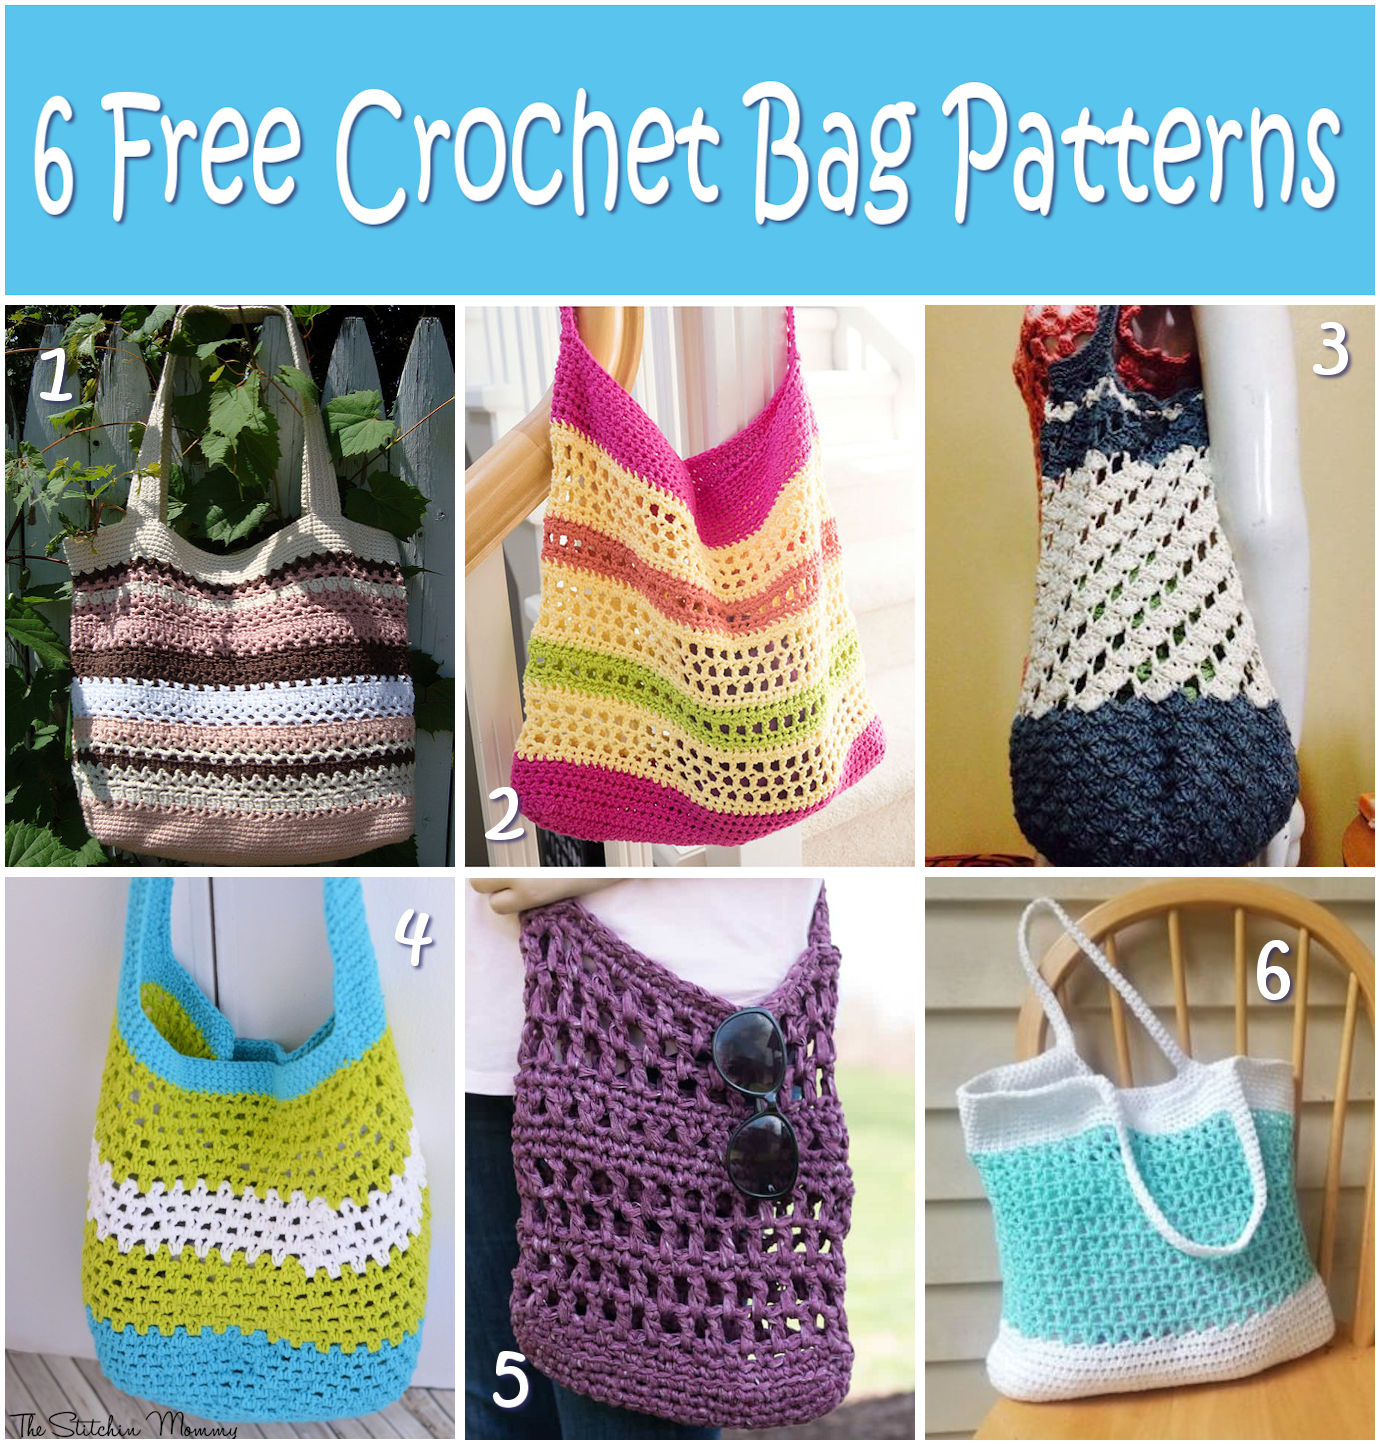 6 Free Crochet Bag Patterns |